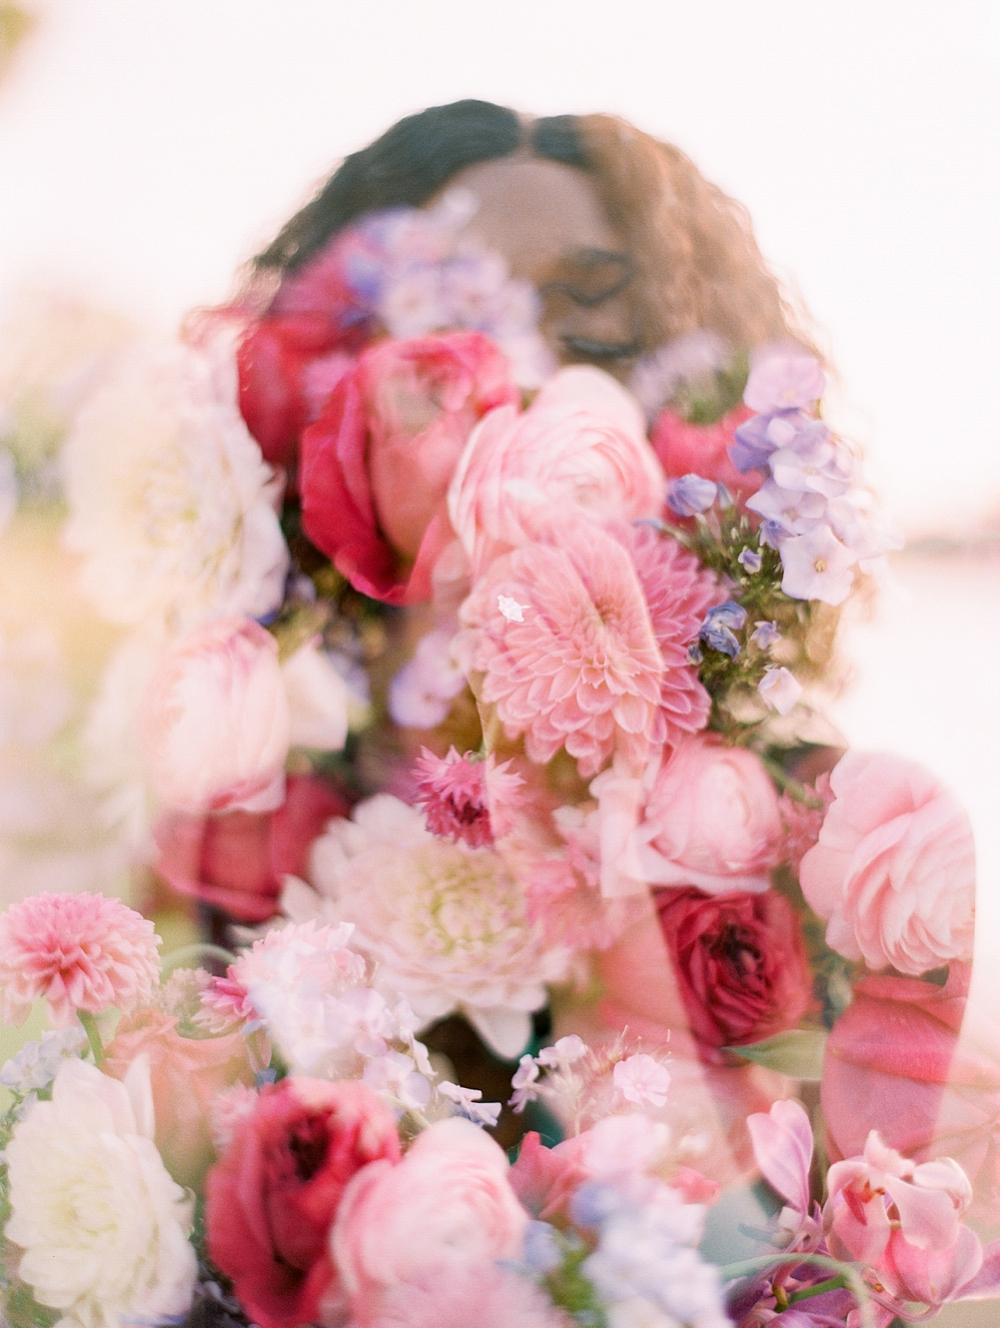 kristin-la-voie-photography-AUSTIN-wedding-BOUDOIR-photographer-54